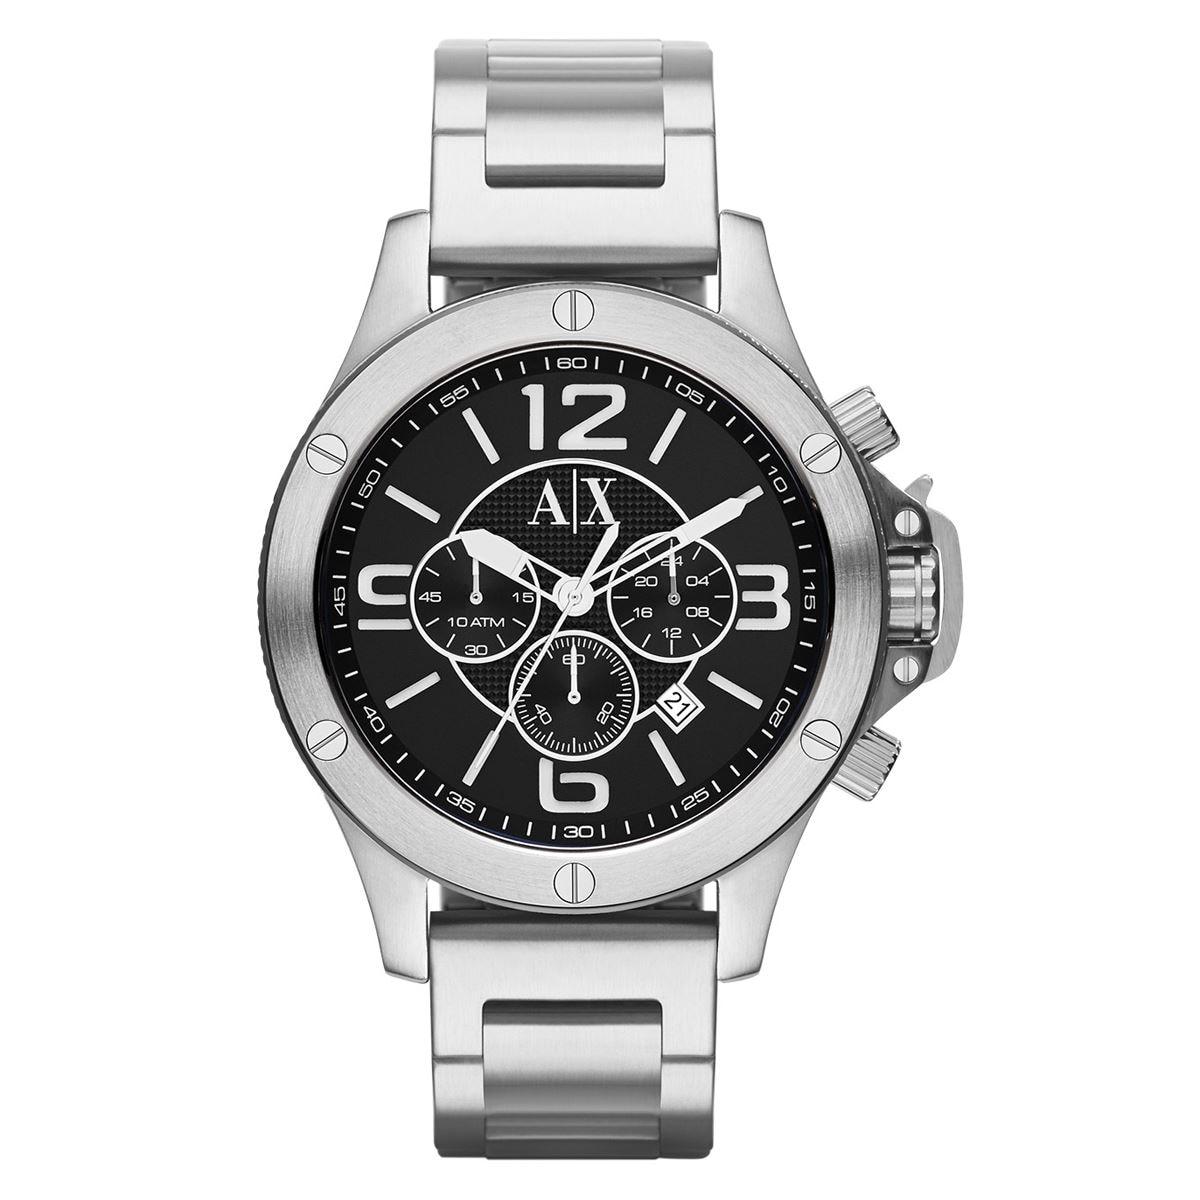 94eebeda203d Reloj armani exchange ax1501